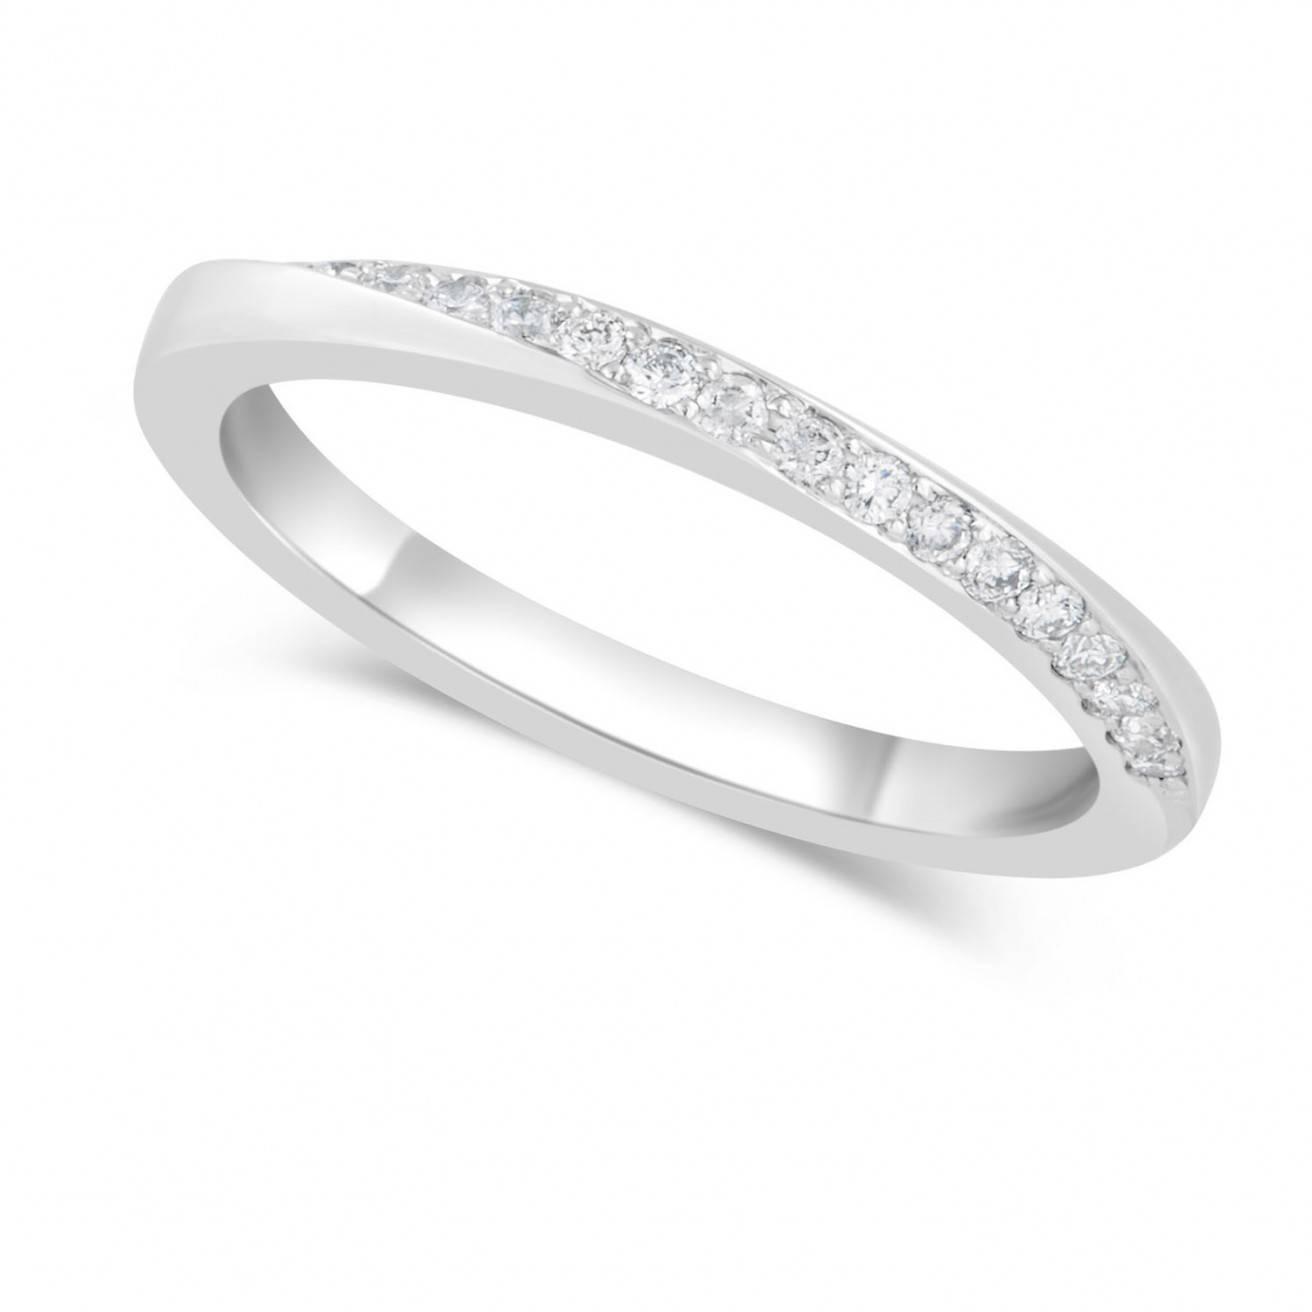 Buy Platinum Wedding Bands Online – Fraser Hart Inside Twisted Diamond Wedding Bands (View 9 of 15)